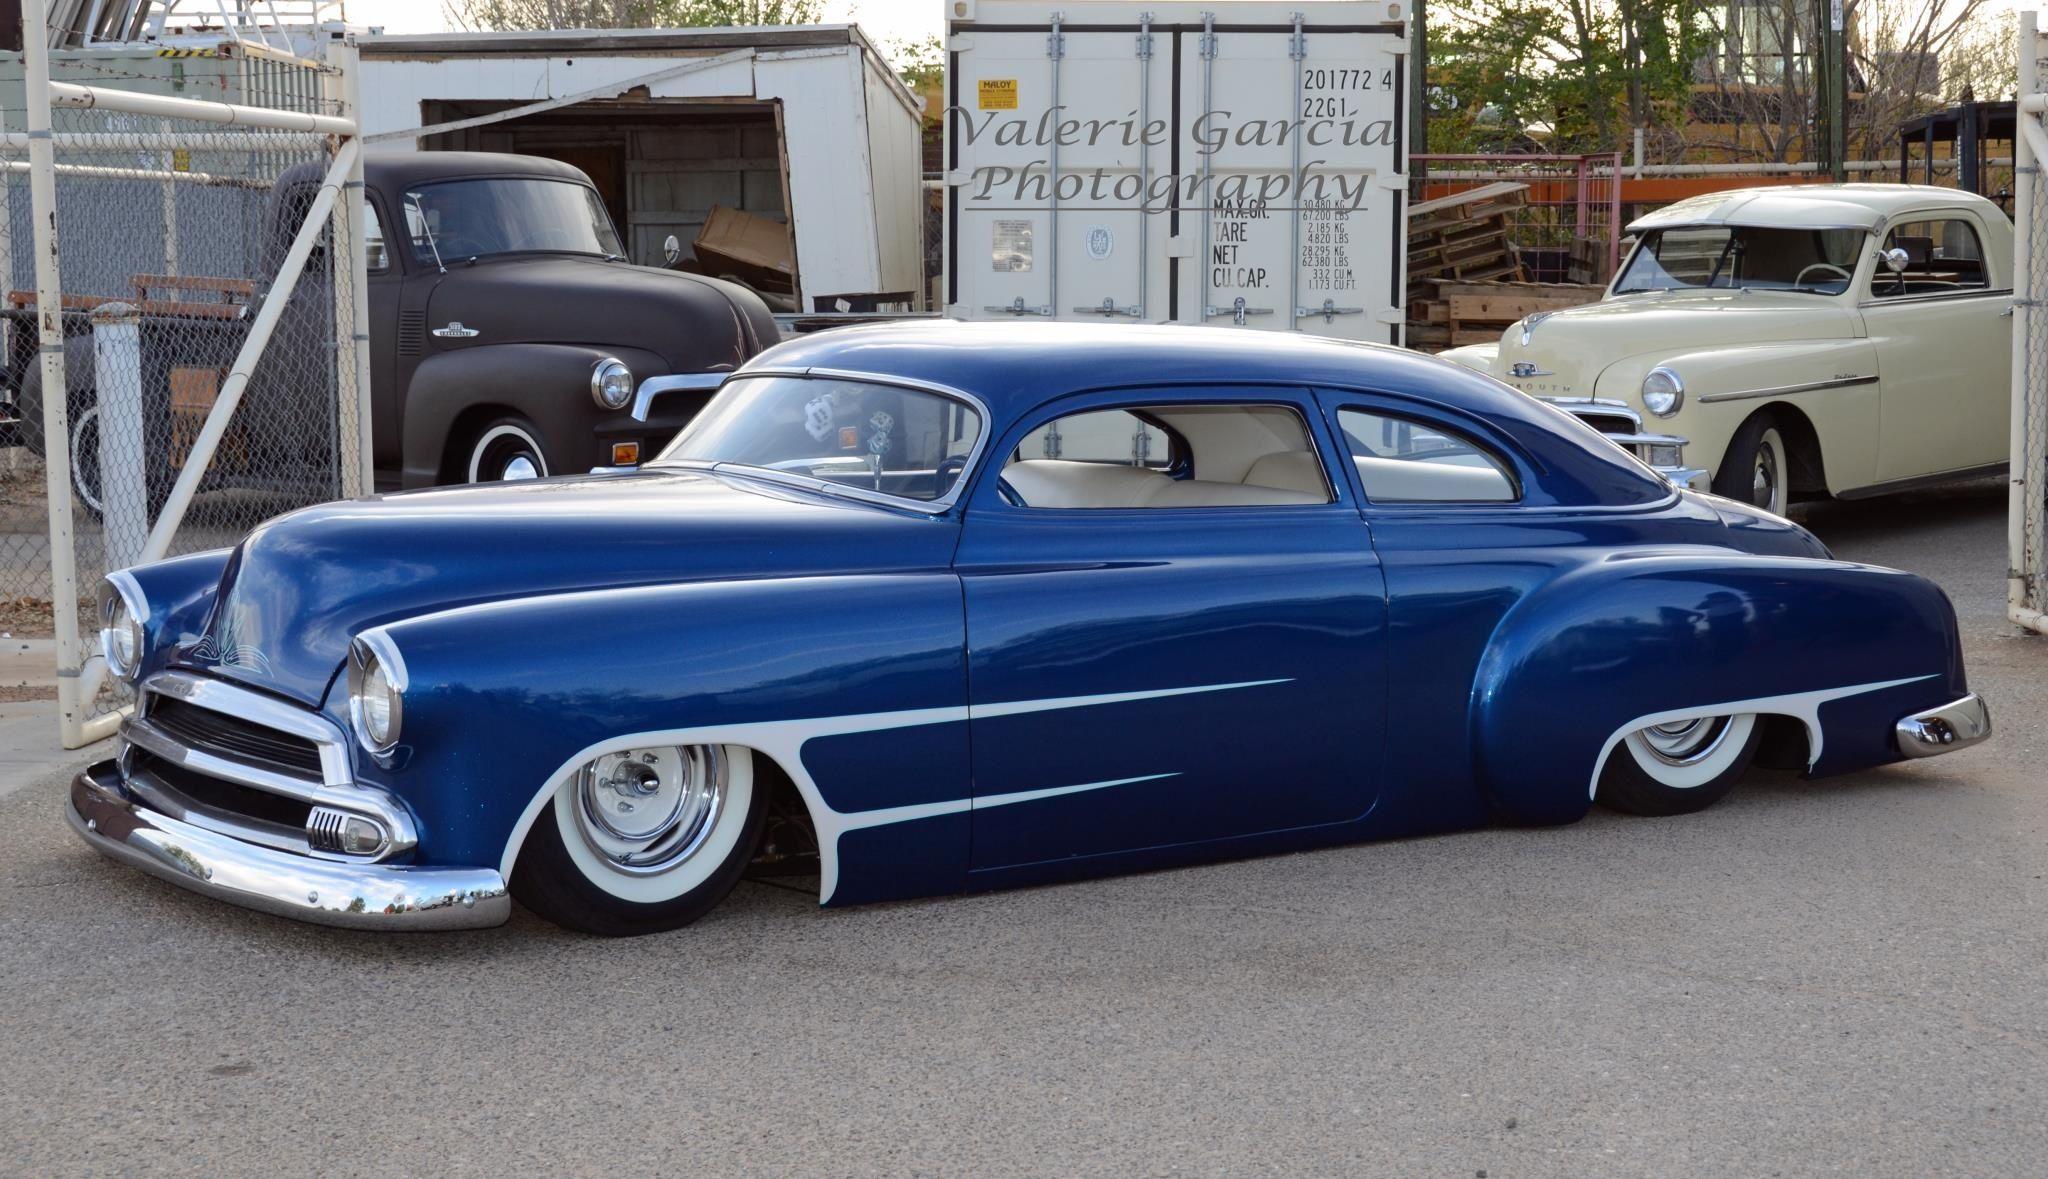 Pin By Tawnya Doyle On Classic Cars Custom Cars Paint Custom Cars Lowrider Cars